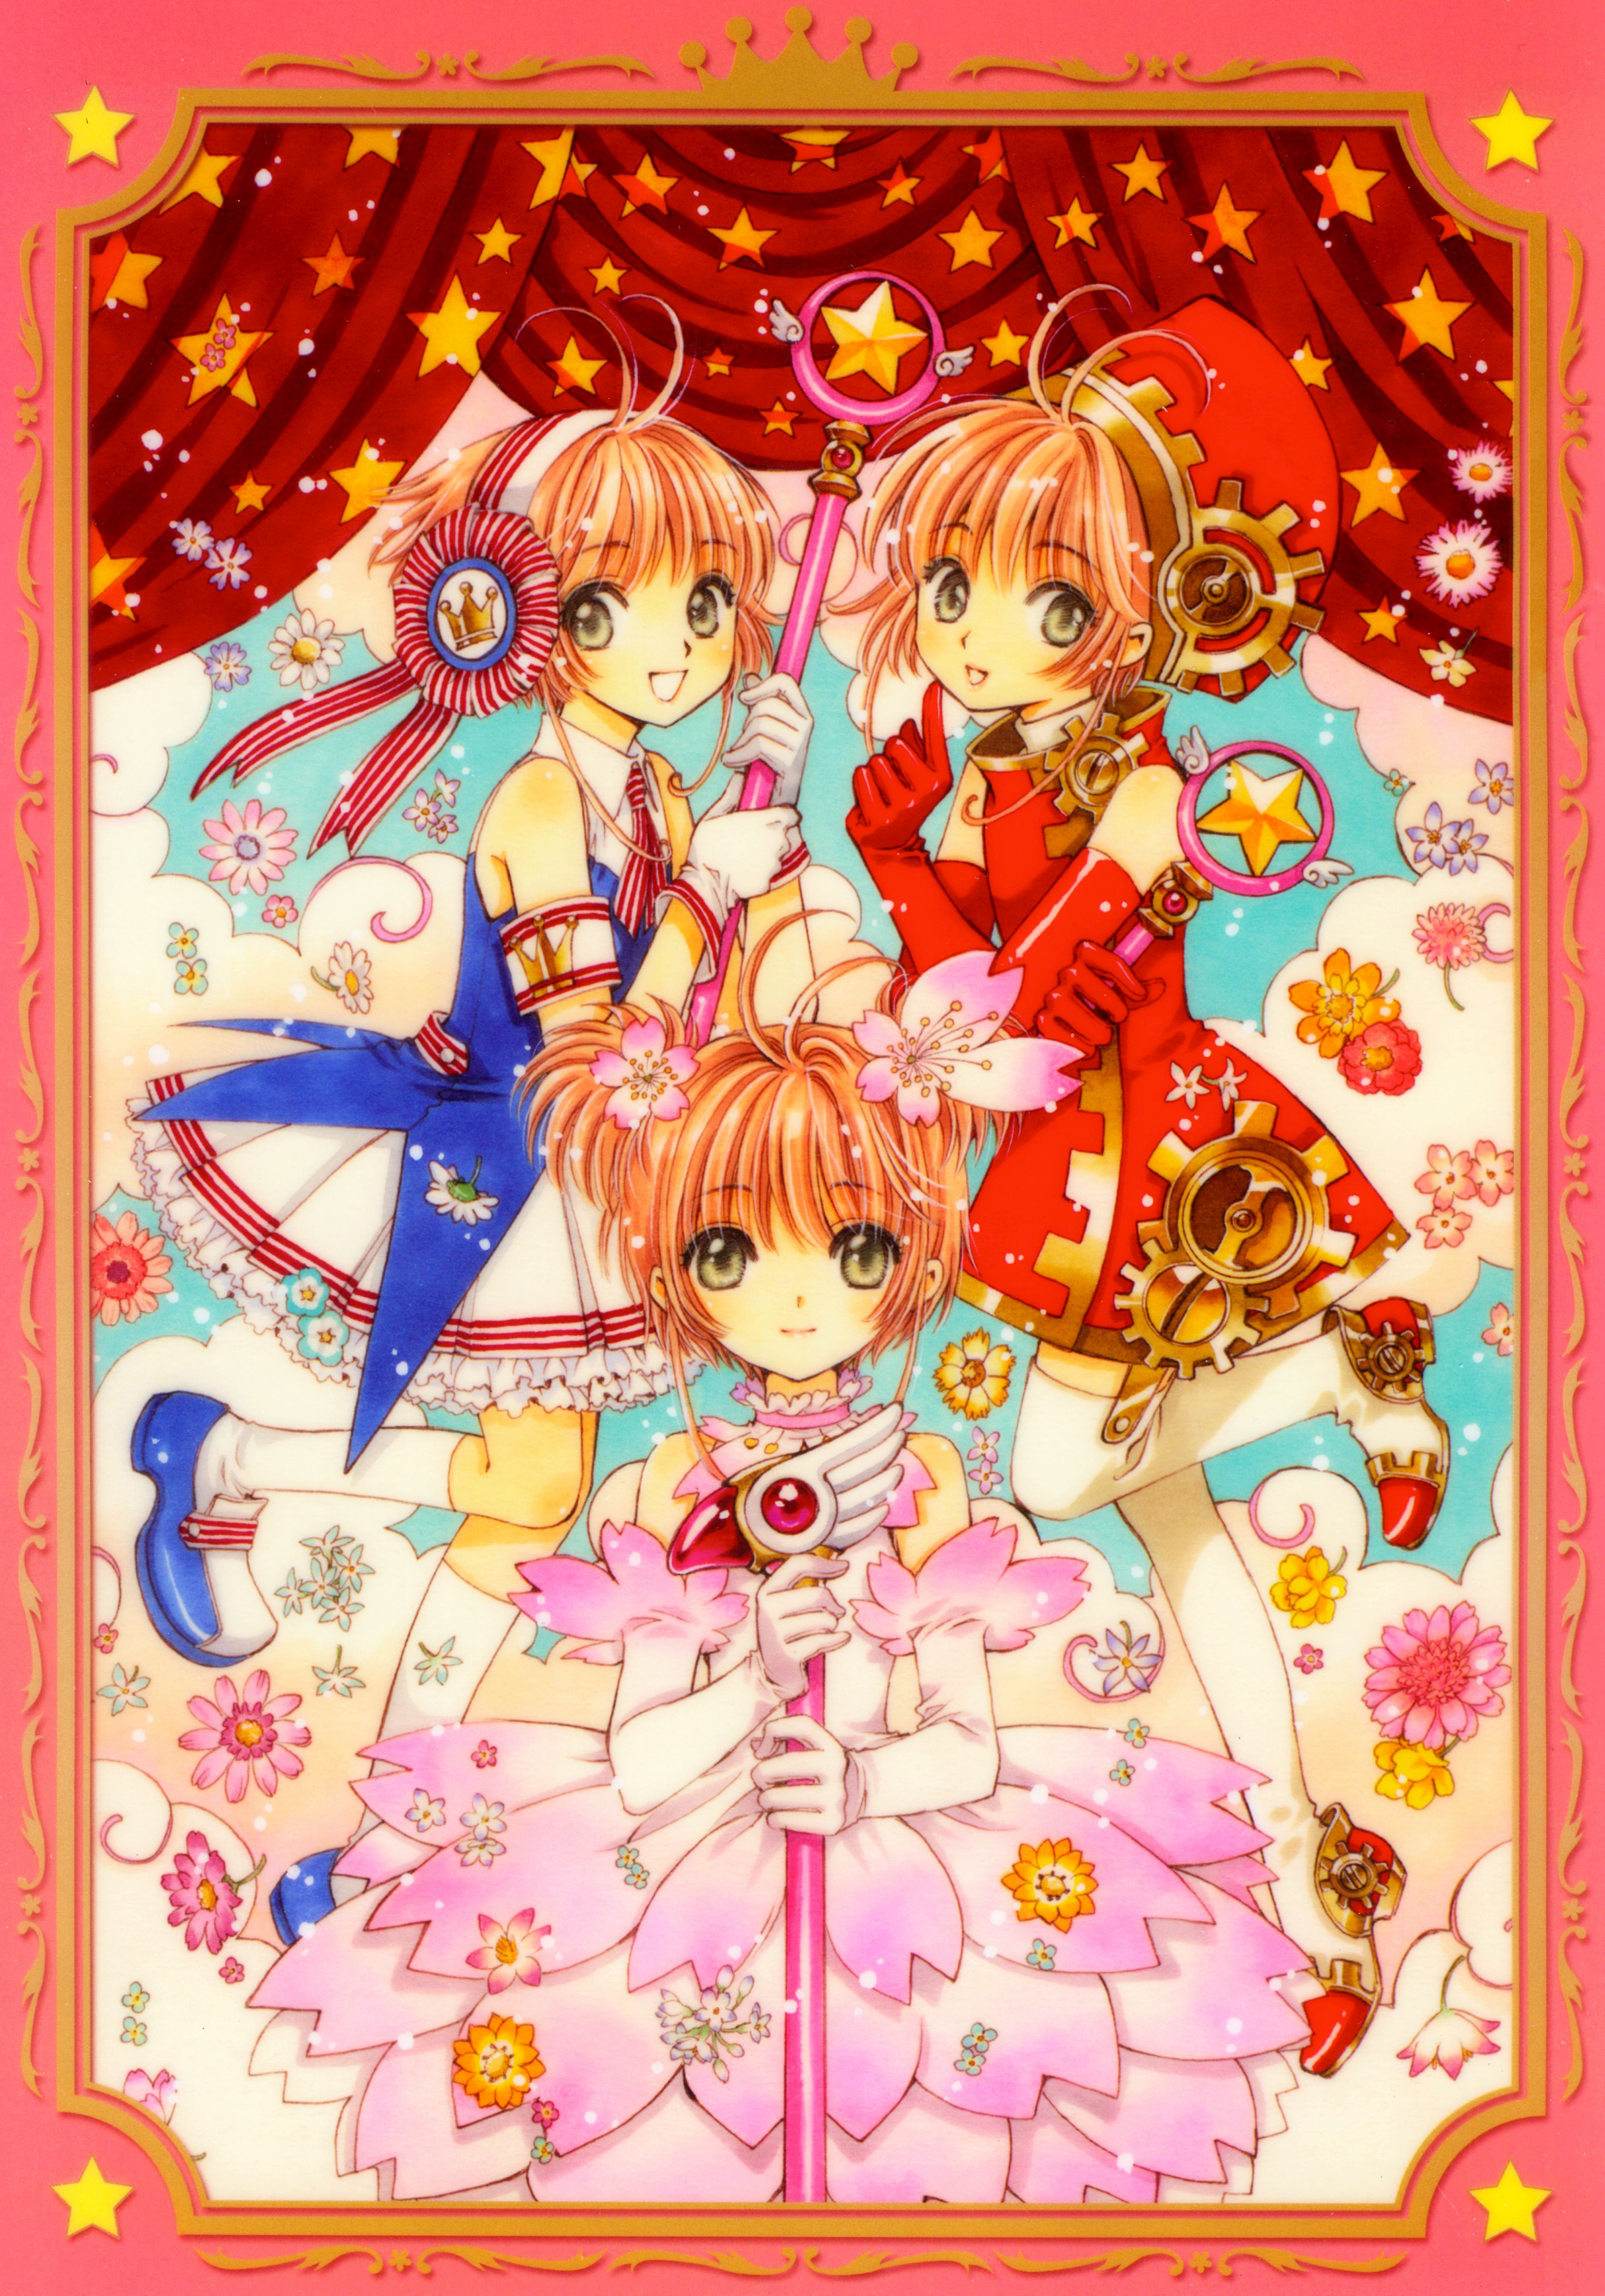 s Clamp Cardcaptor Sakura Kinomoto Sakura Scan Official Art Mobile Wallpaper